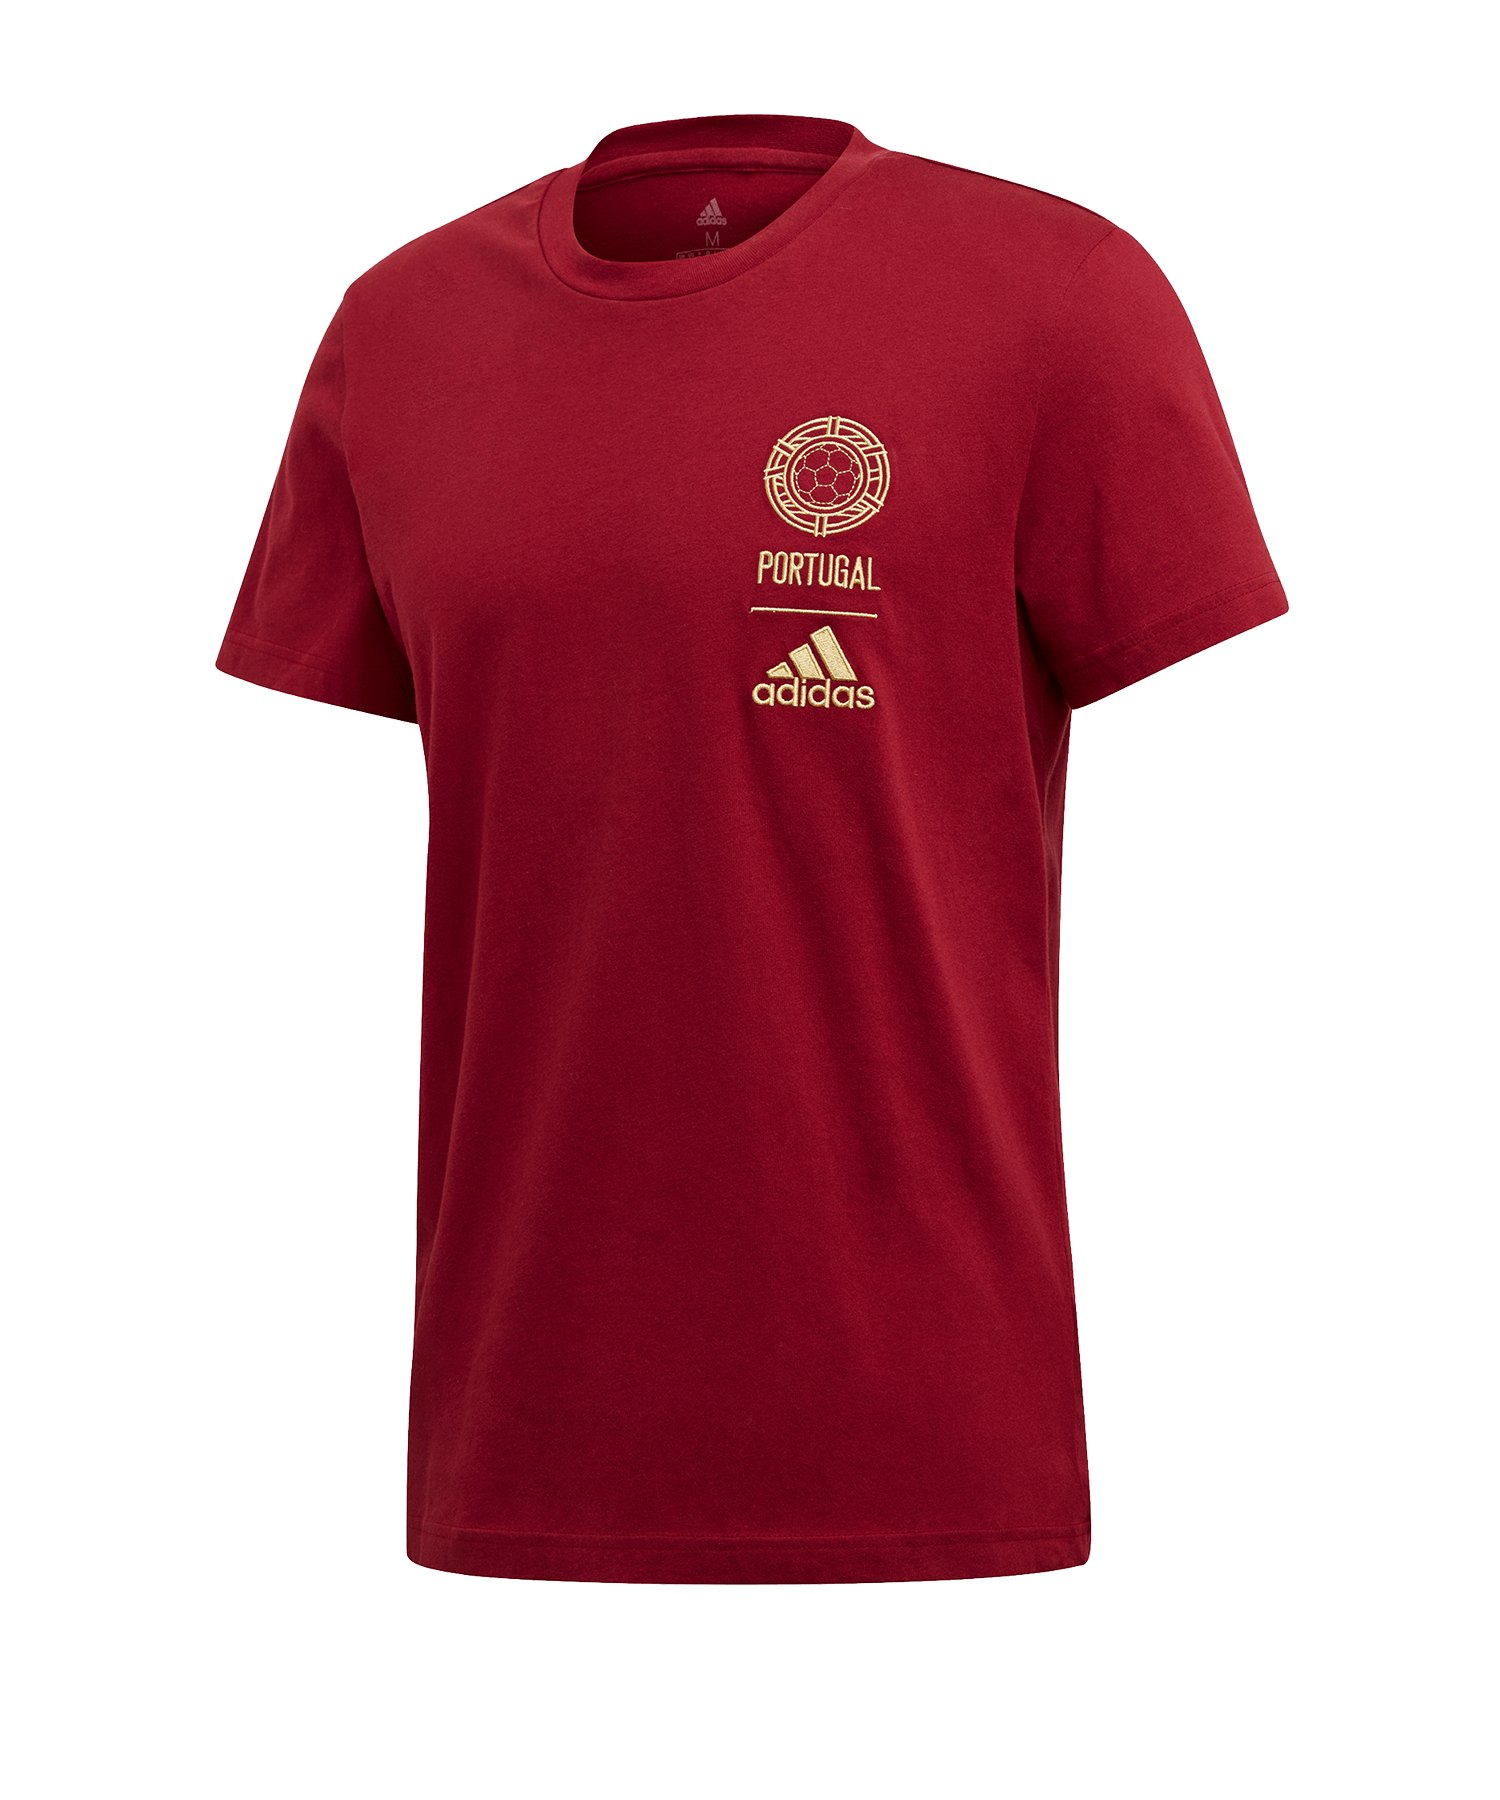 adidas Portugal T-Shirt Rot - rot